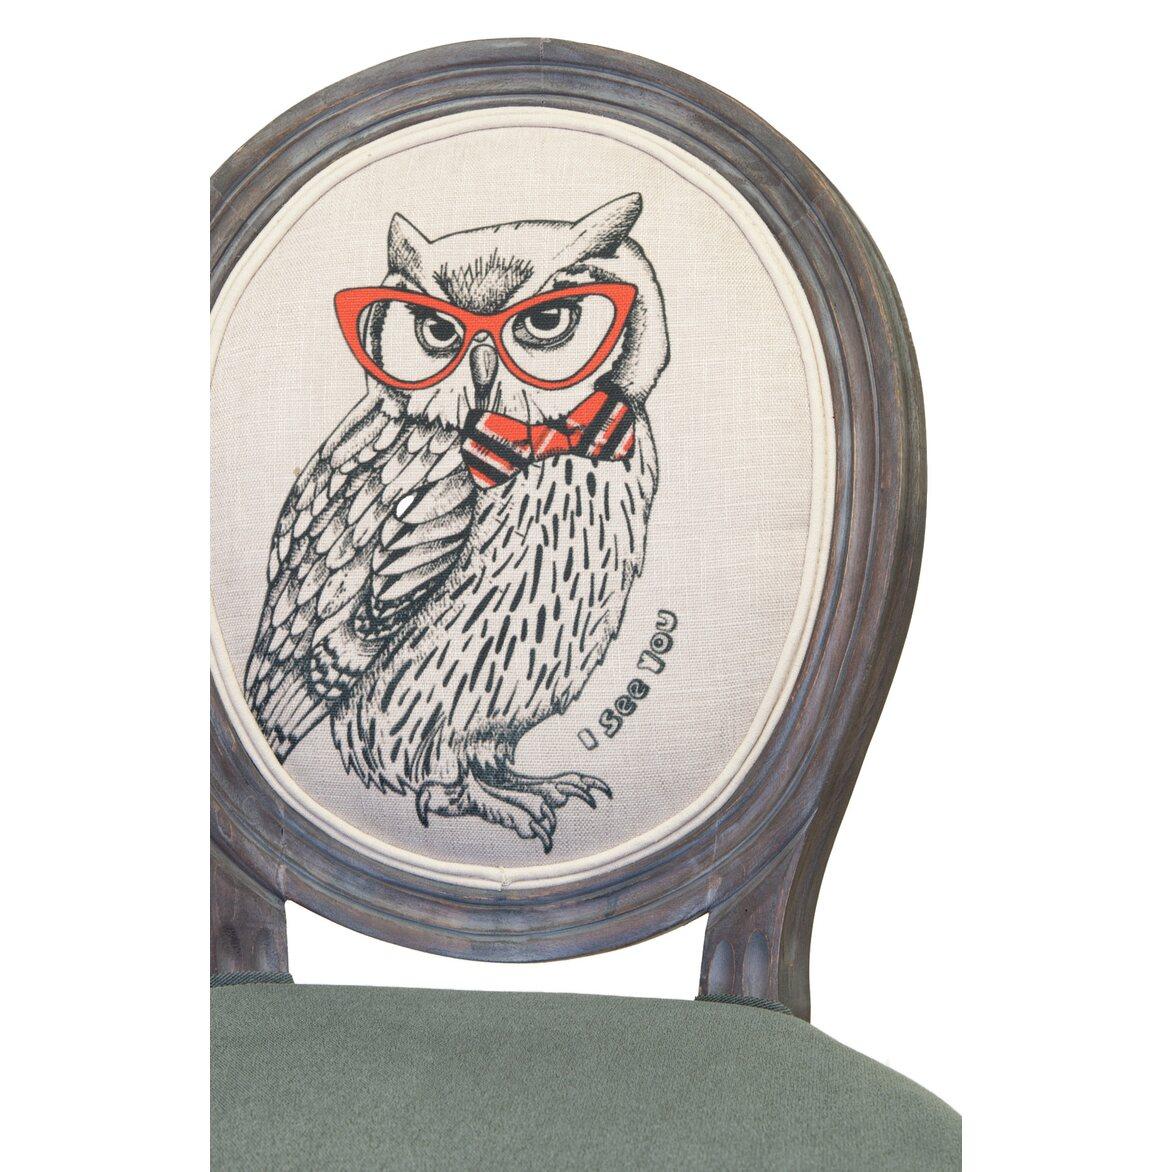 Стул Volker owl ver. 2 5 | Обеденные стулья Kingsby